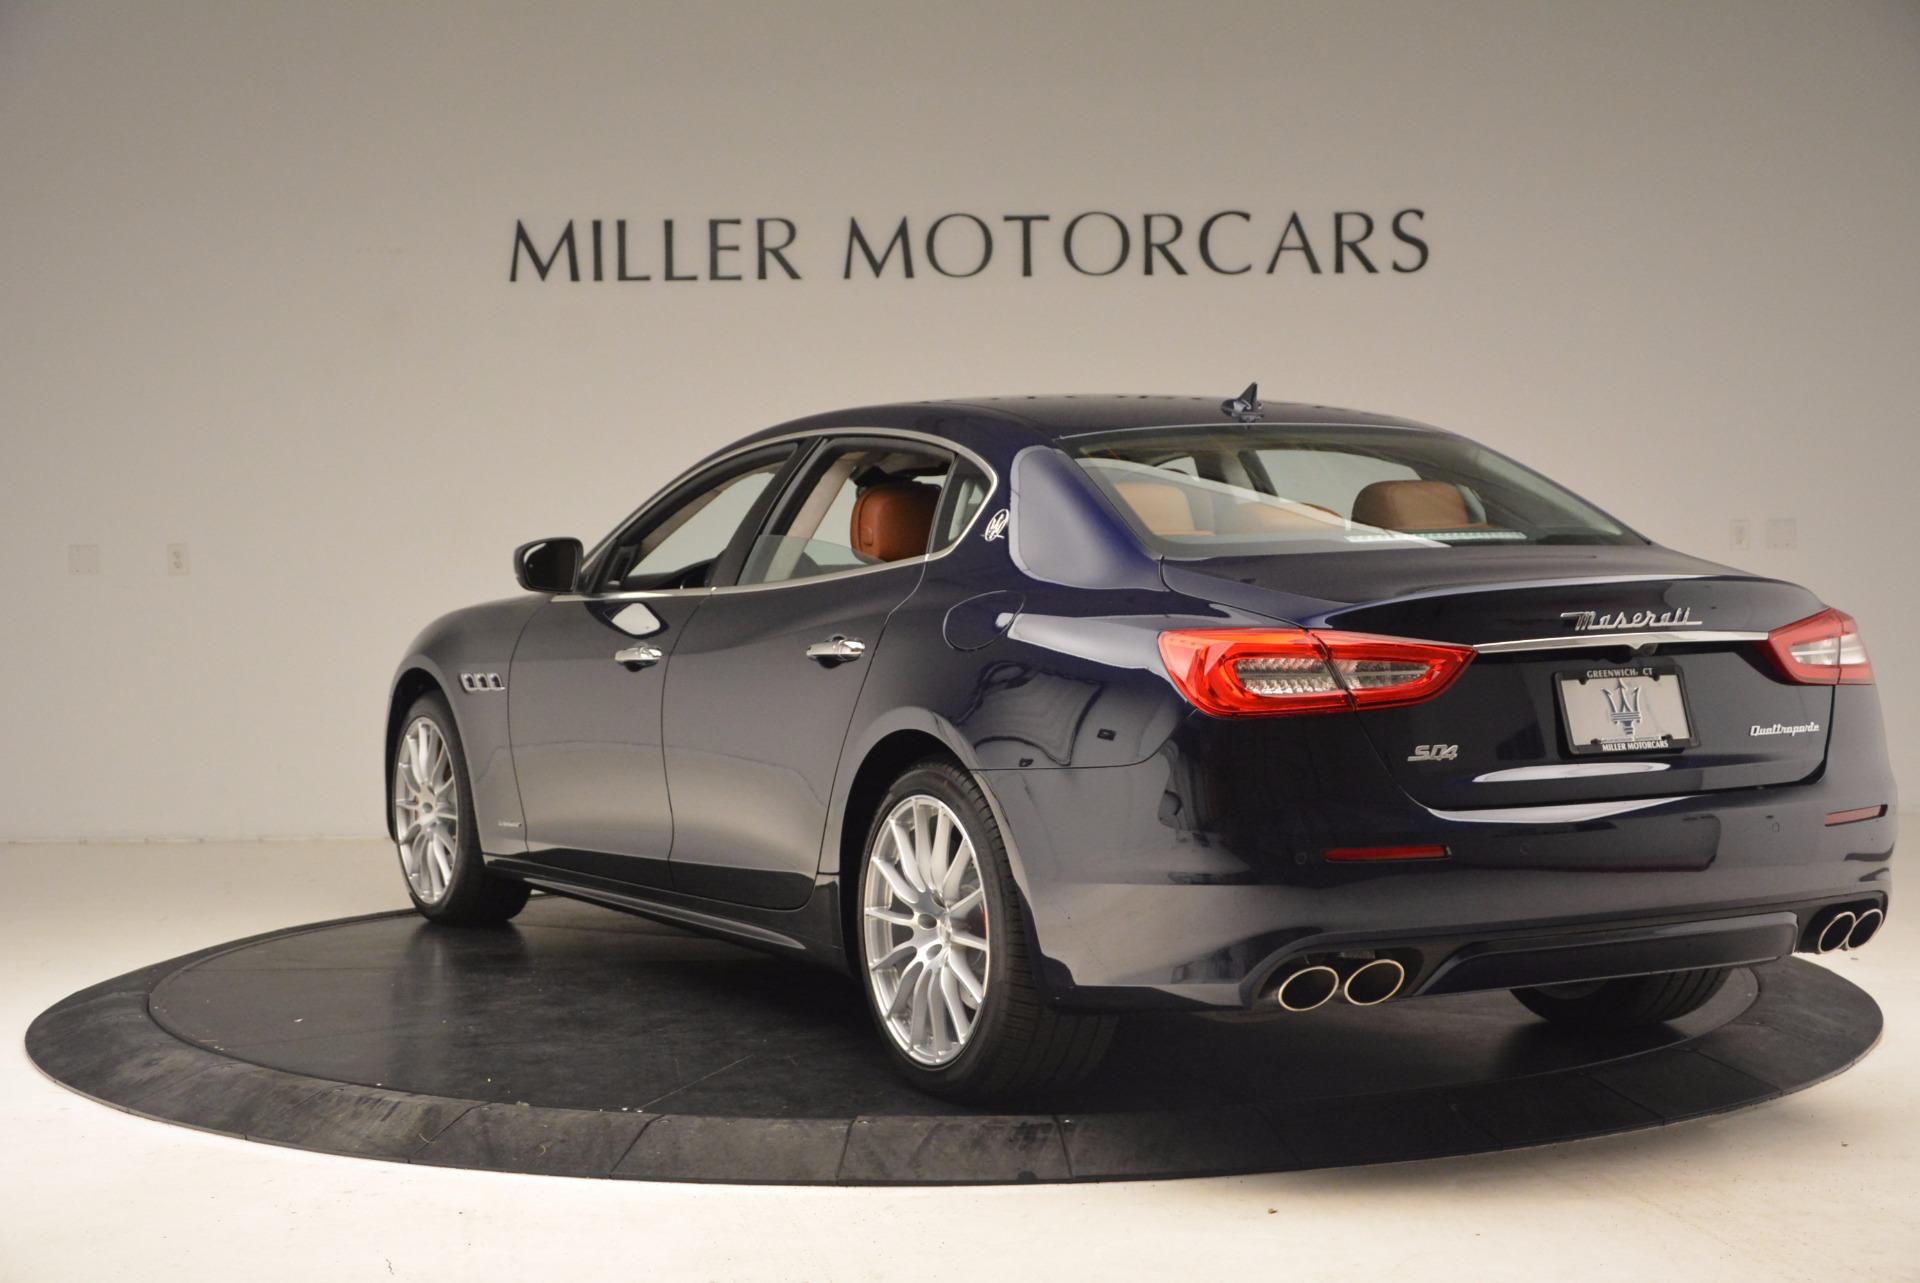 New-2018-Maserati-Quattroporte-S-Q4-GranLusso